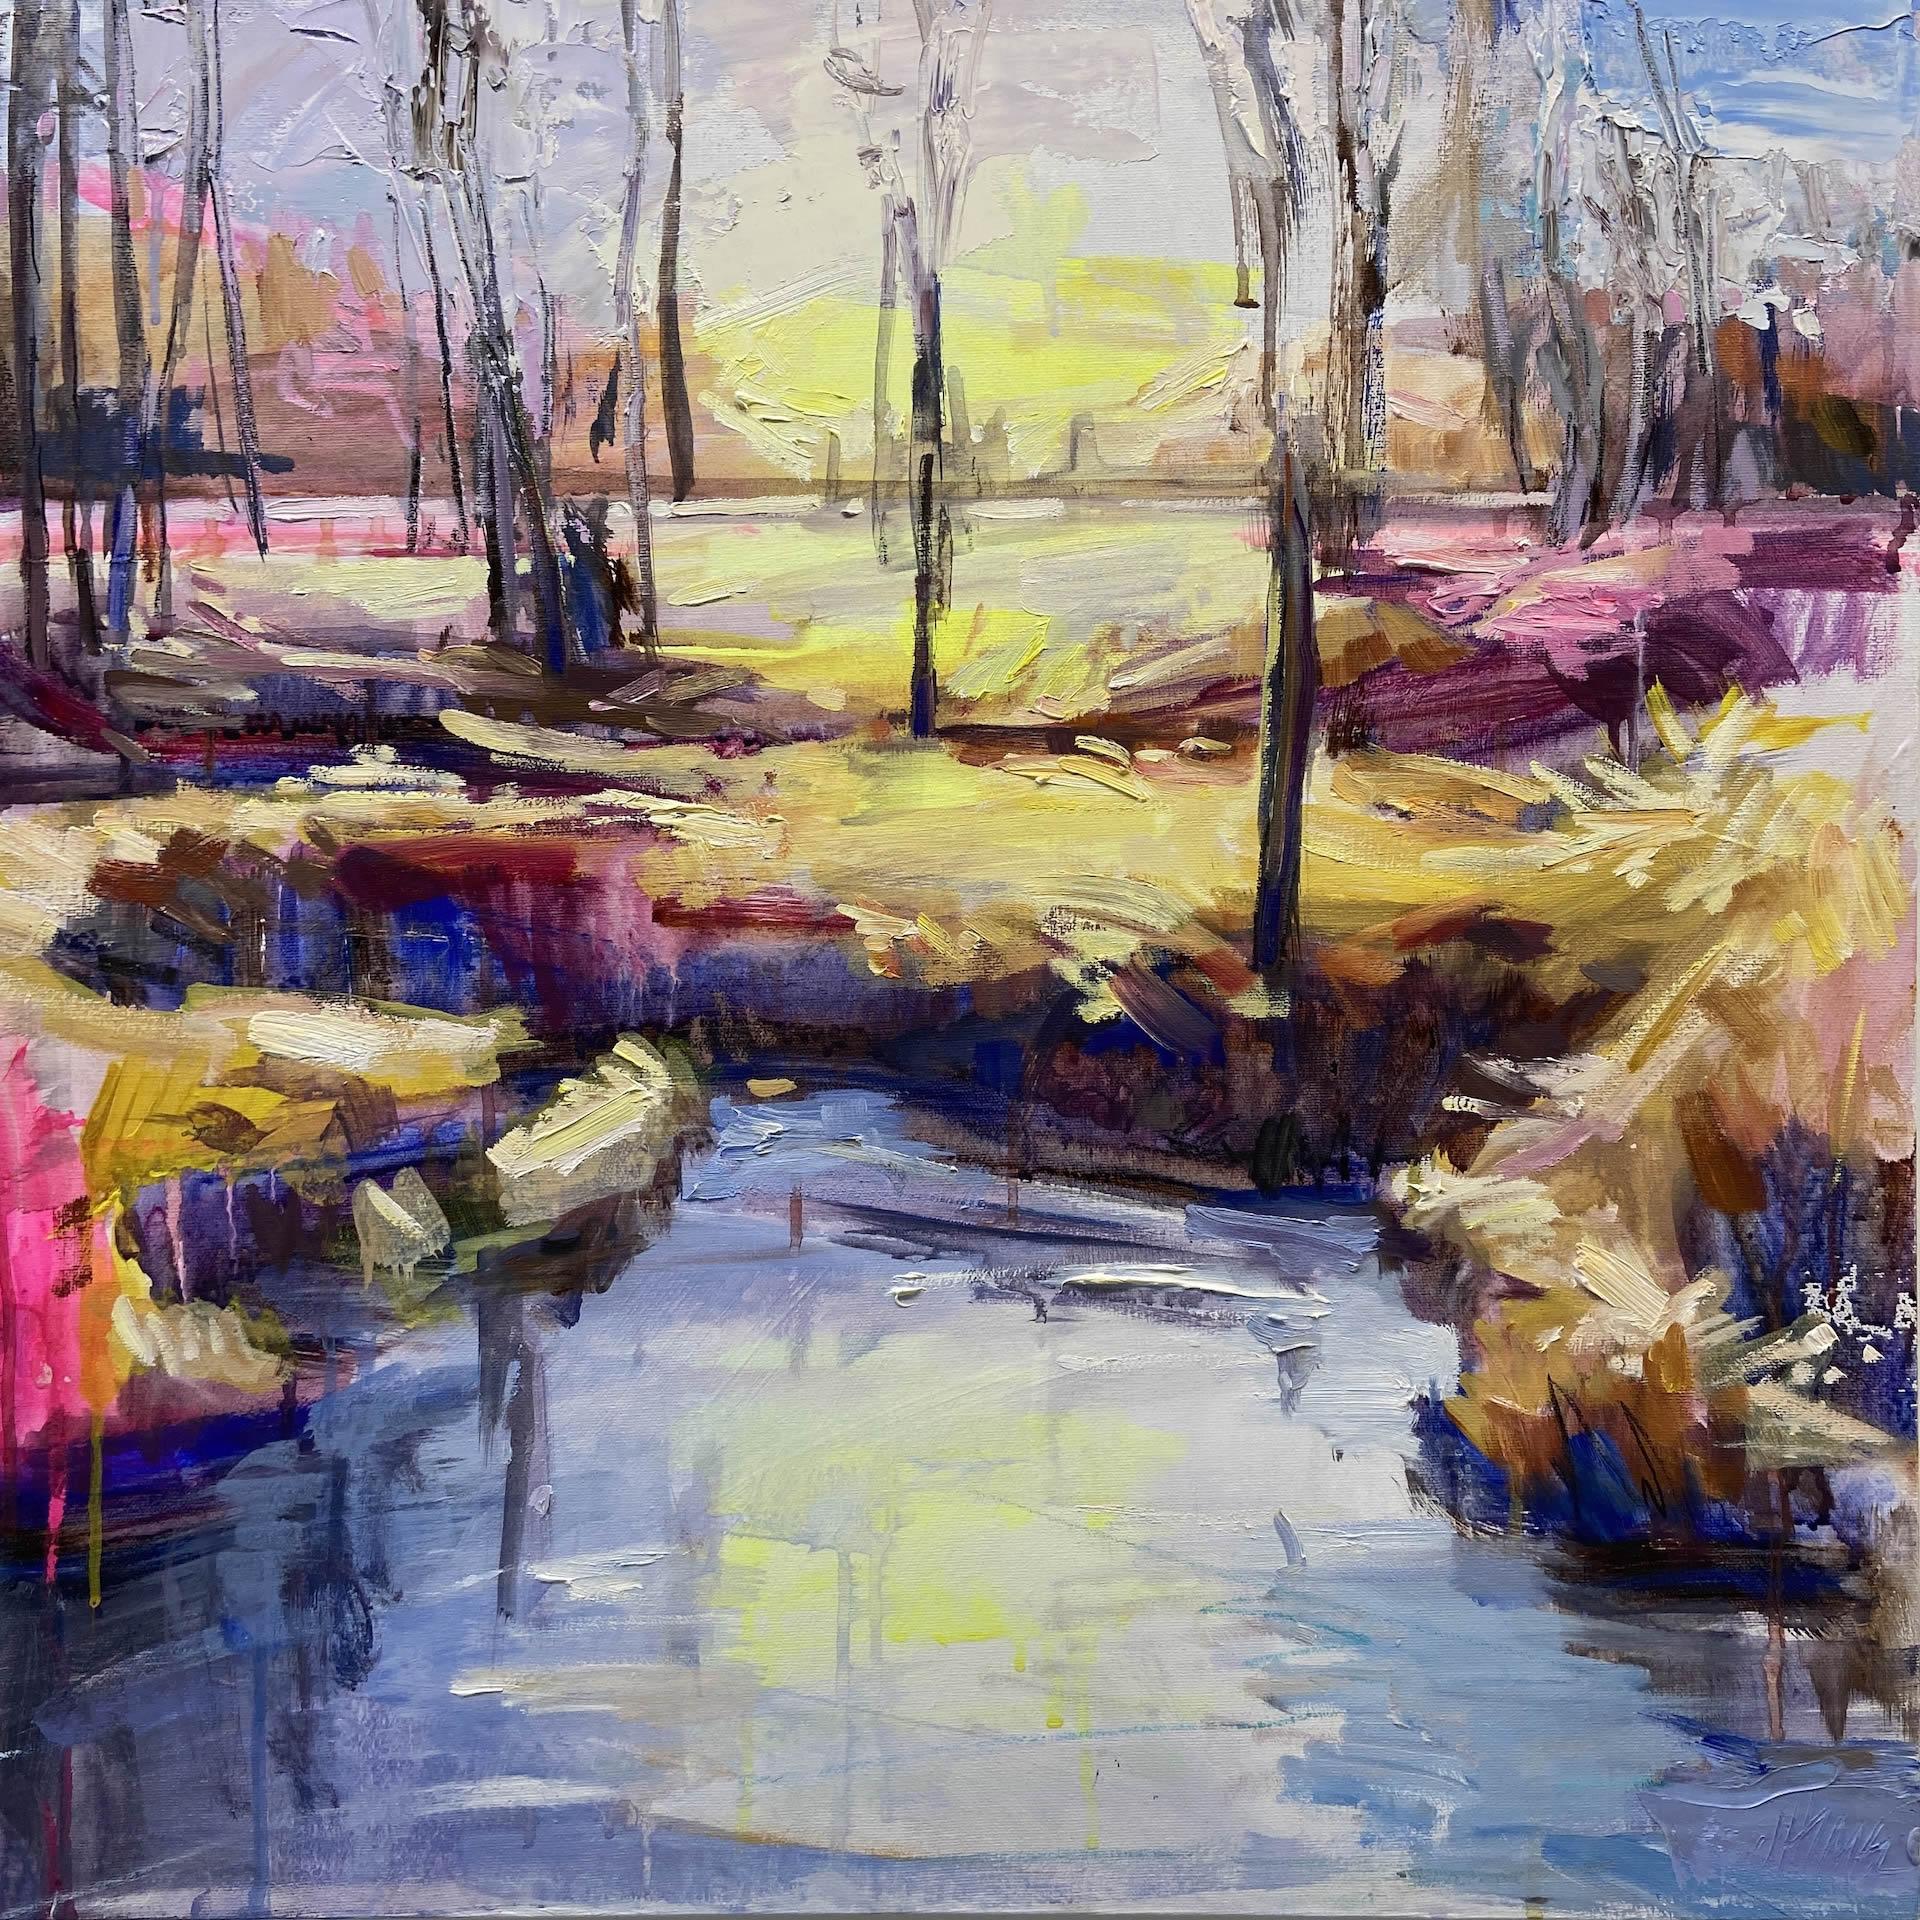 Julie-Himel-Shutter-Speed-Of-A-Daydream-4-2020-Oil-On-Canvas-24x24-2000-Online-Art-Galleries